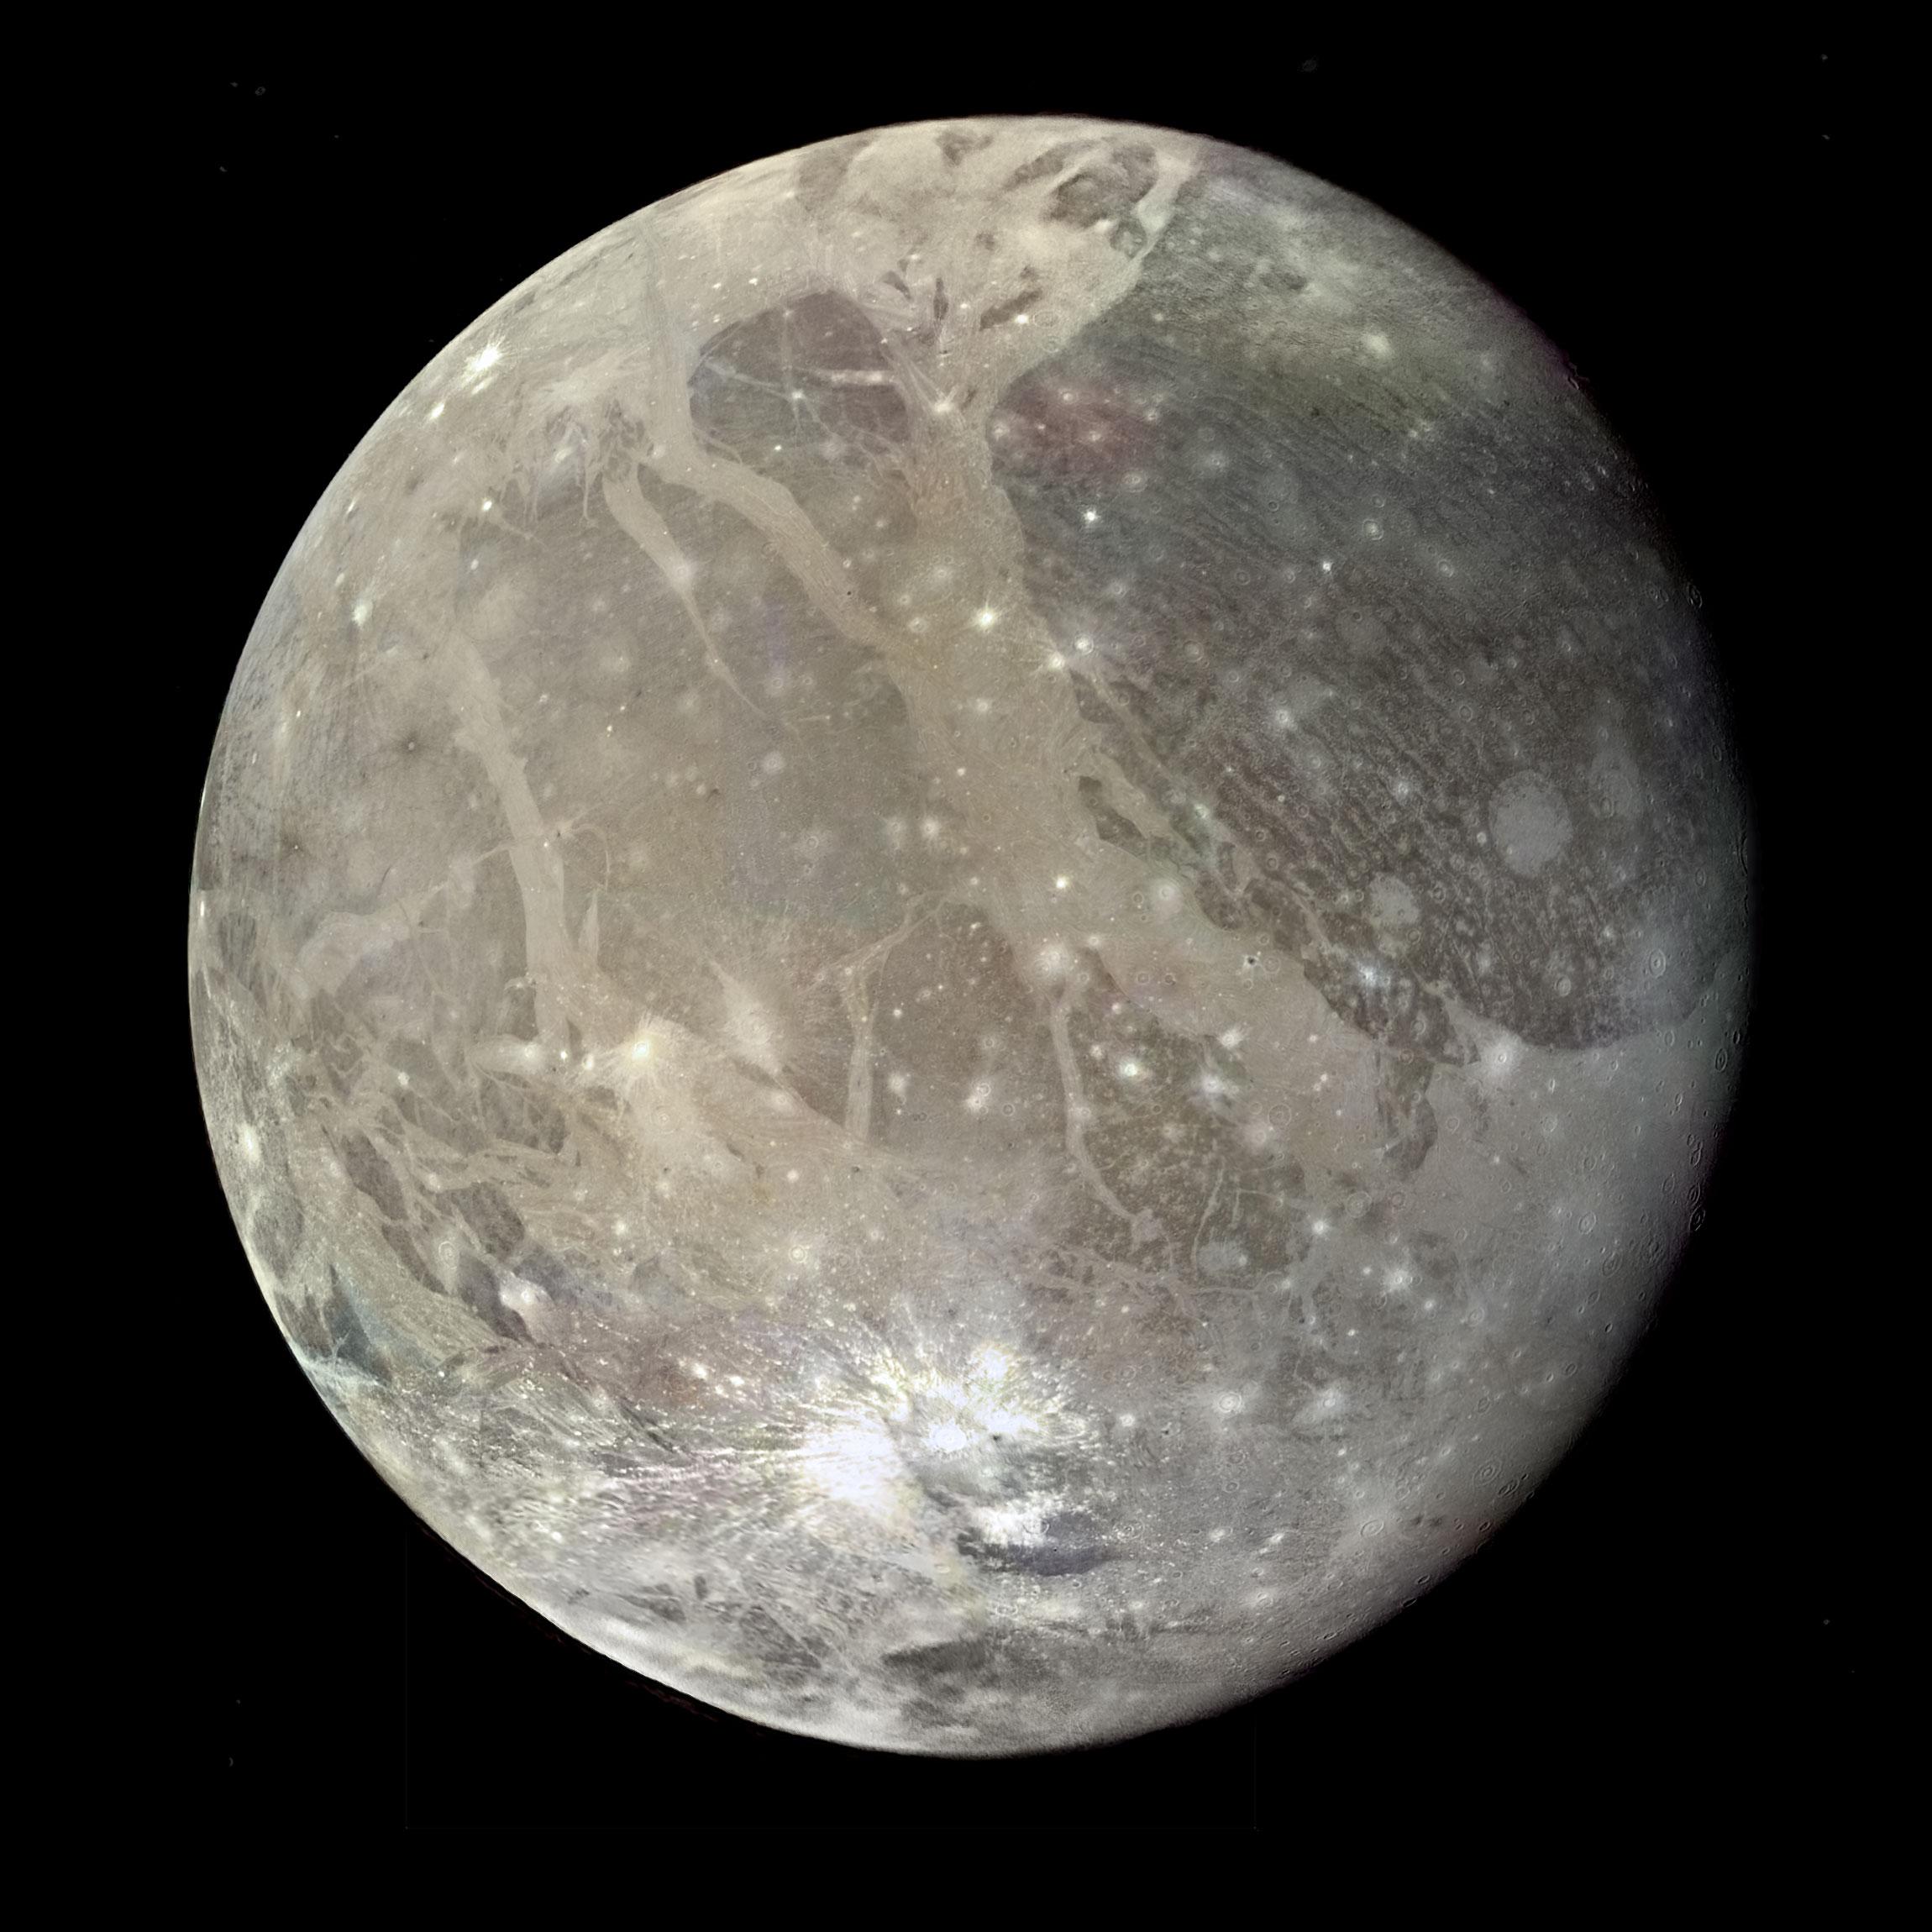 Mercury Hd Wallpaper Space In Images 2016 08 Ganymede